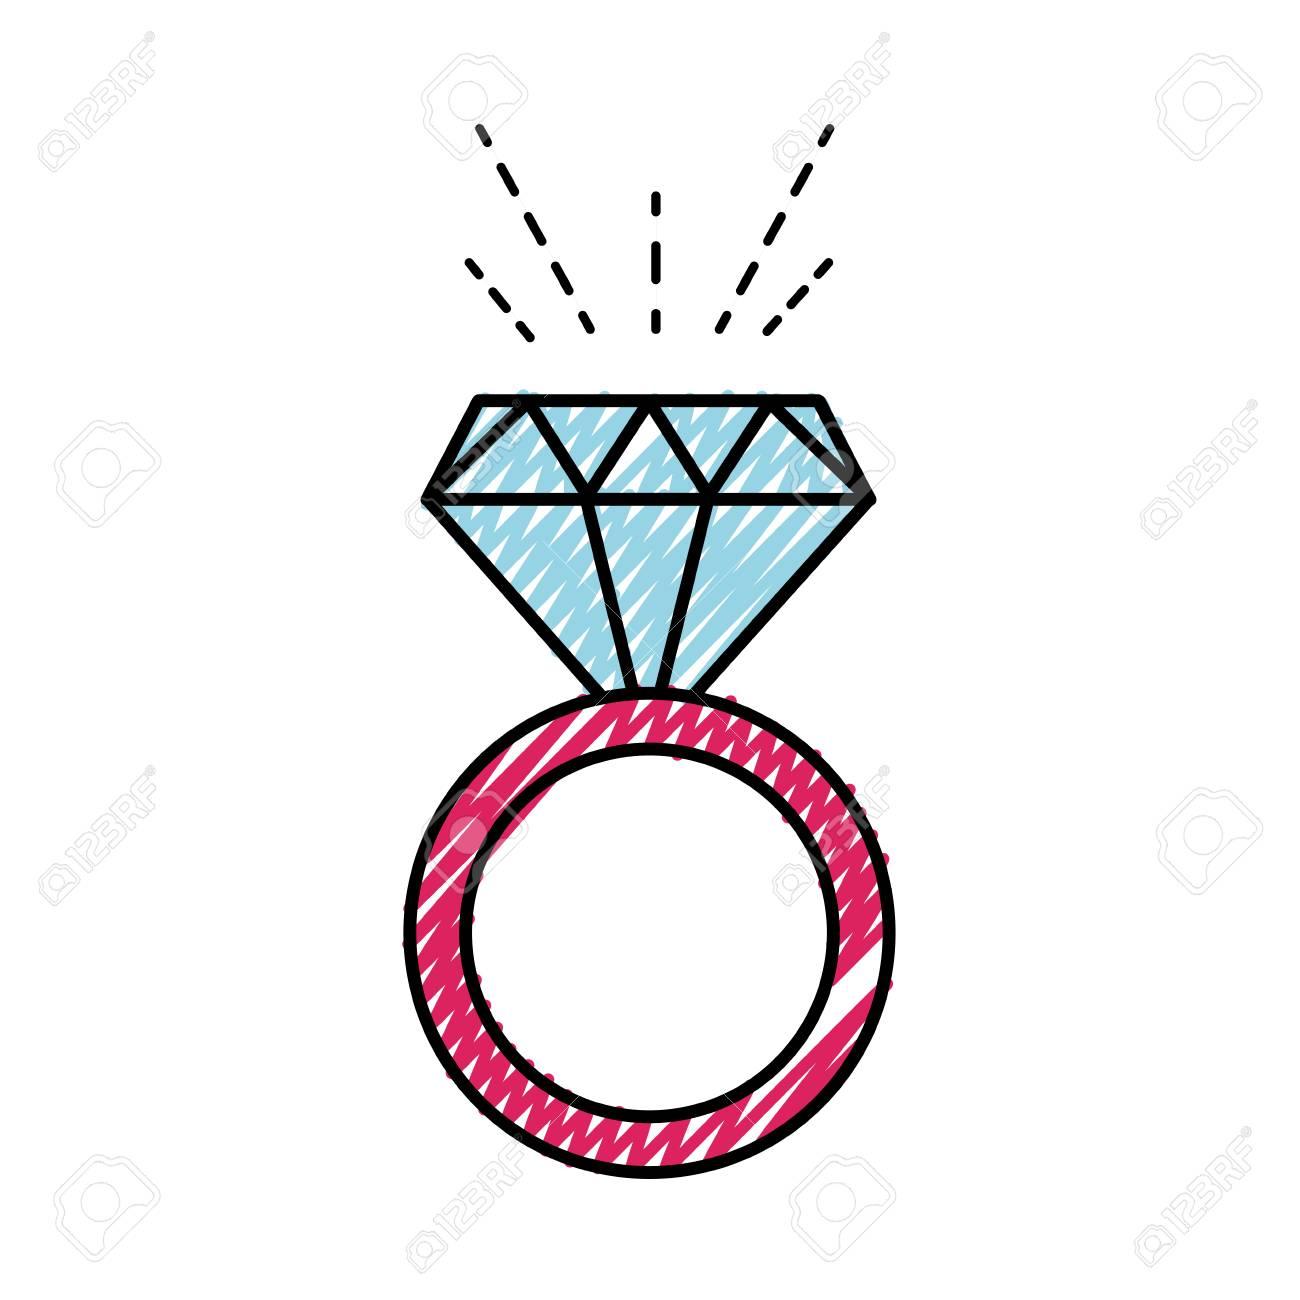 engagement ring wedding with diamondb royalty free cliparts vectors rh 123rf com wedding vector free wedding vector file